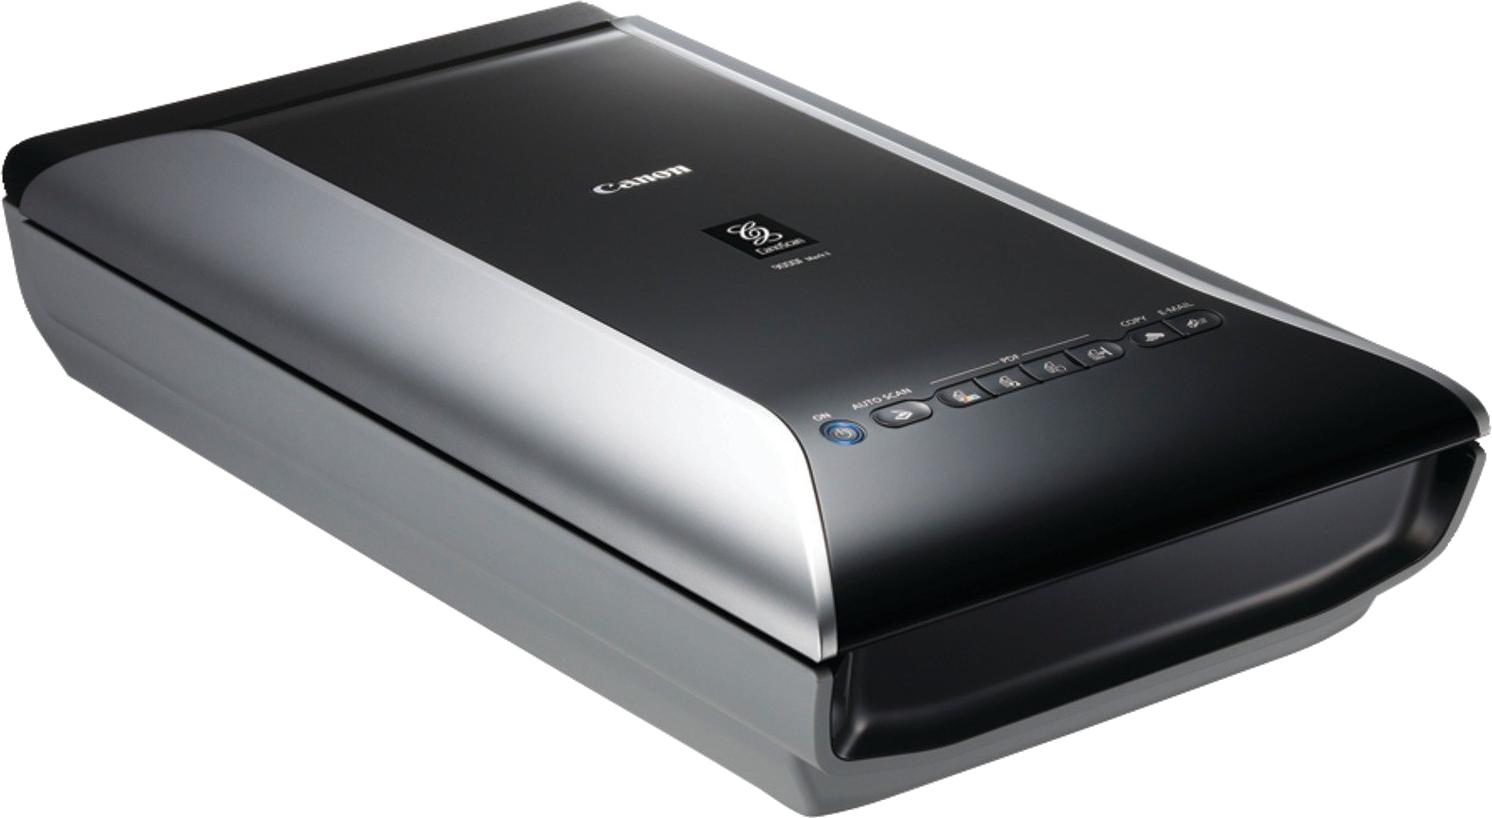 Scanner HD PNG - 95291